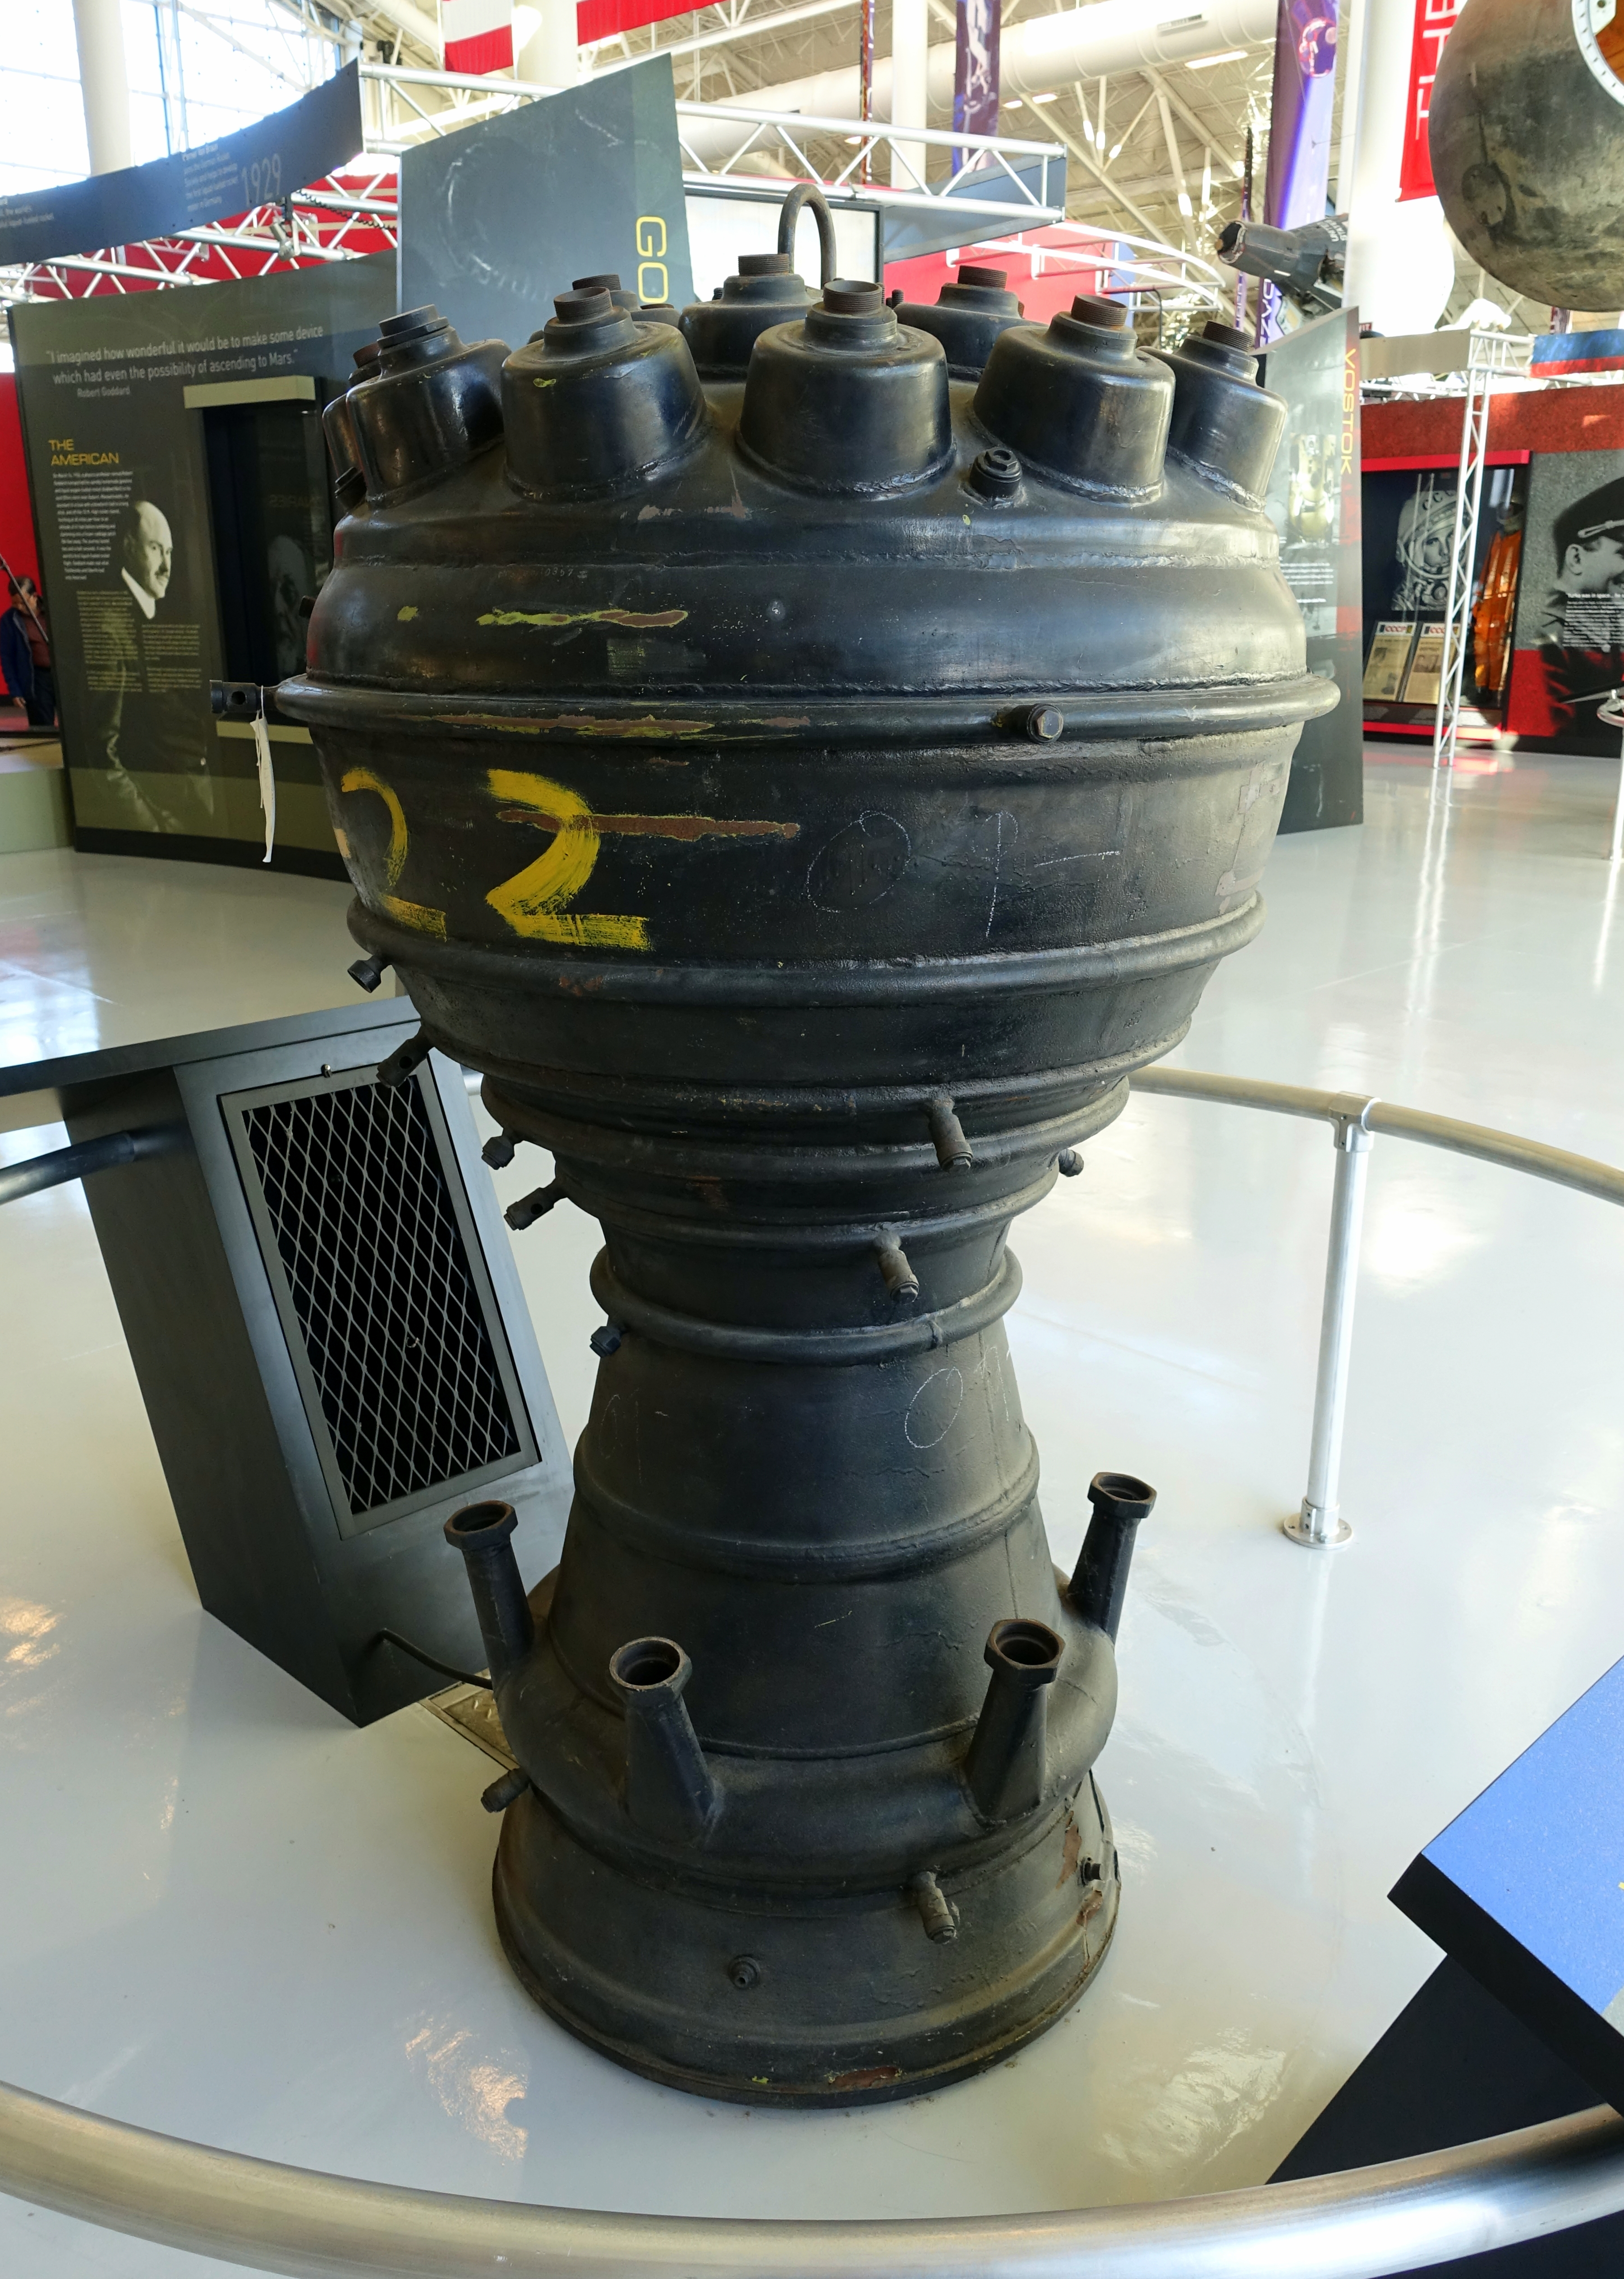 File:V2 rocket engine - Evergreen Aviation & Space Museum